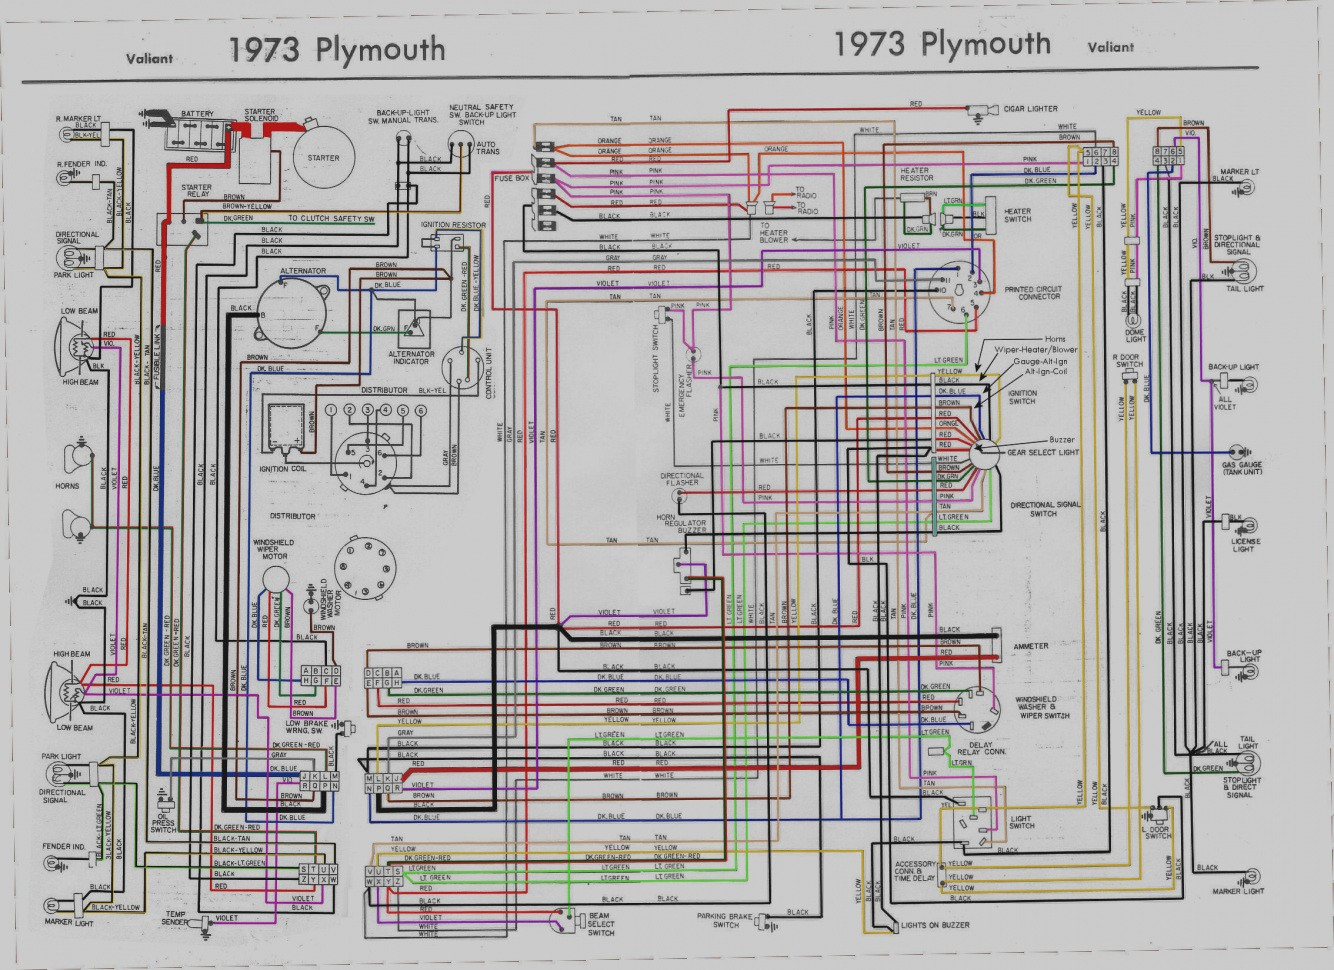 1972 dodge challenger wiring diagram | wiring diagram 1972 dodge wiring diagram 1978 dodge truck wiring diagram wiring diagram